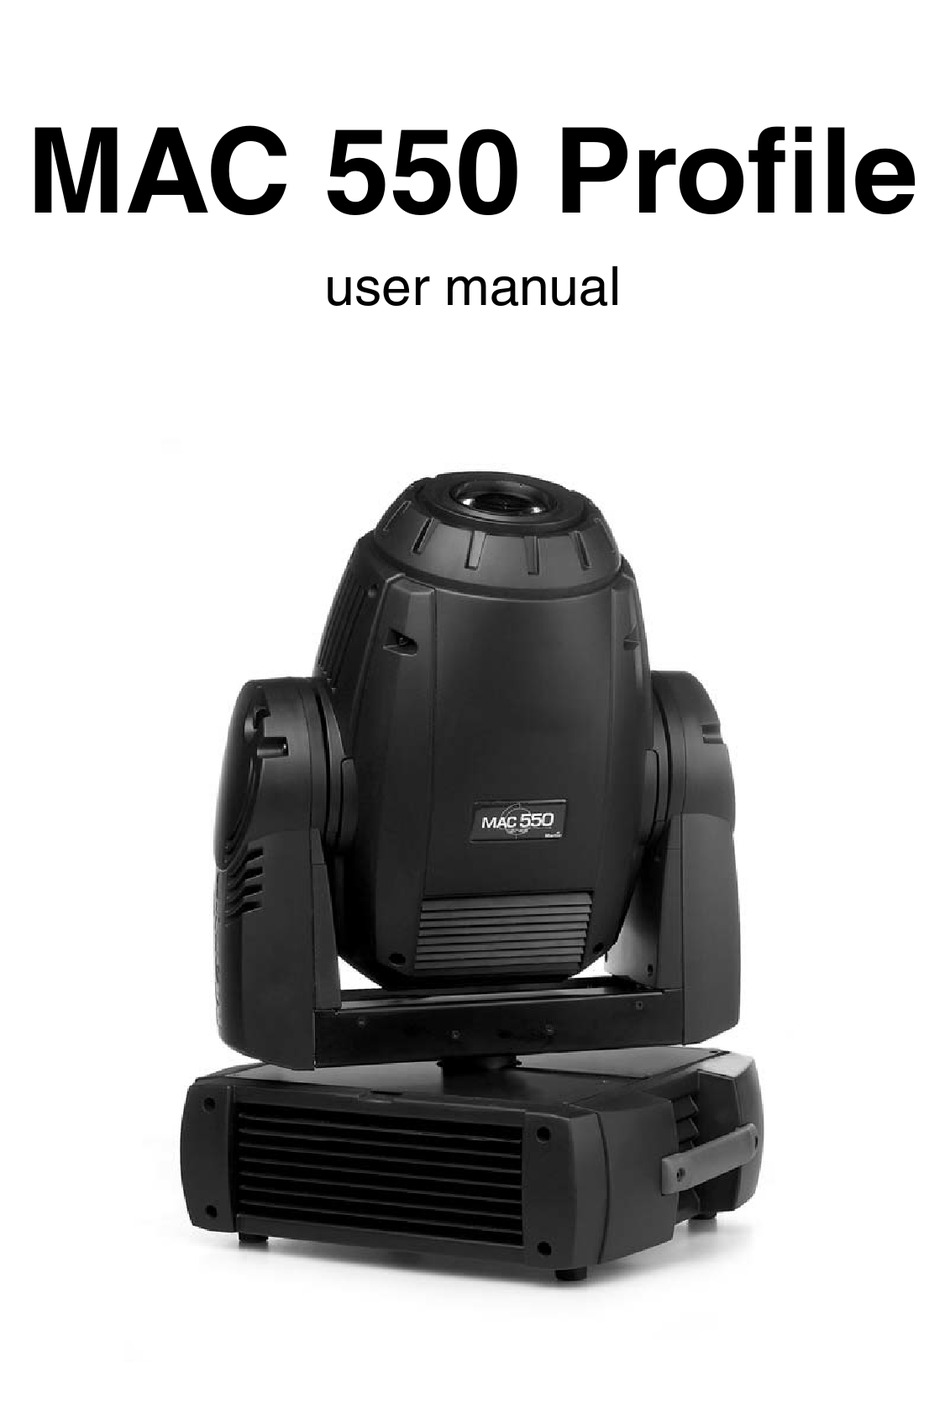 Mac 575 spot manual online